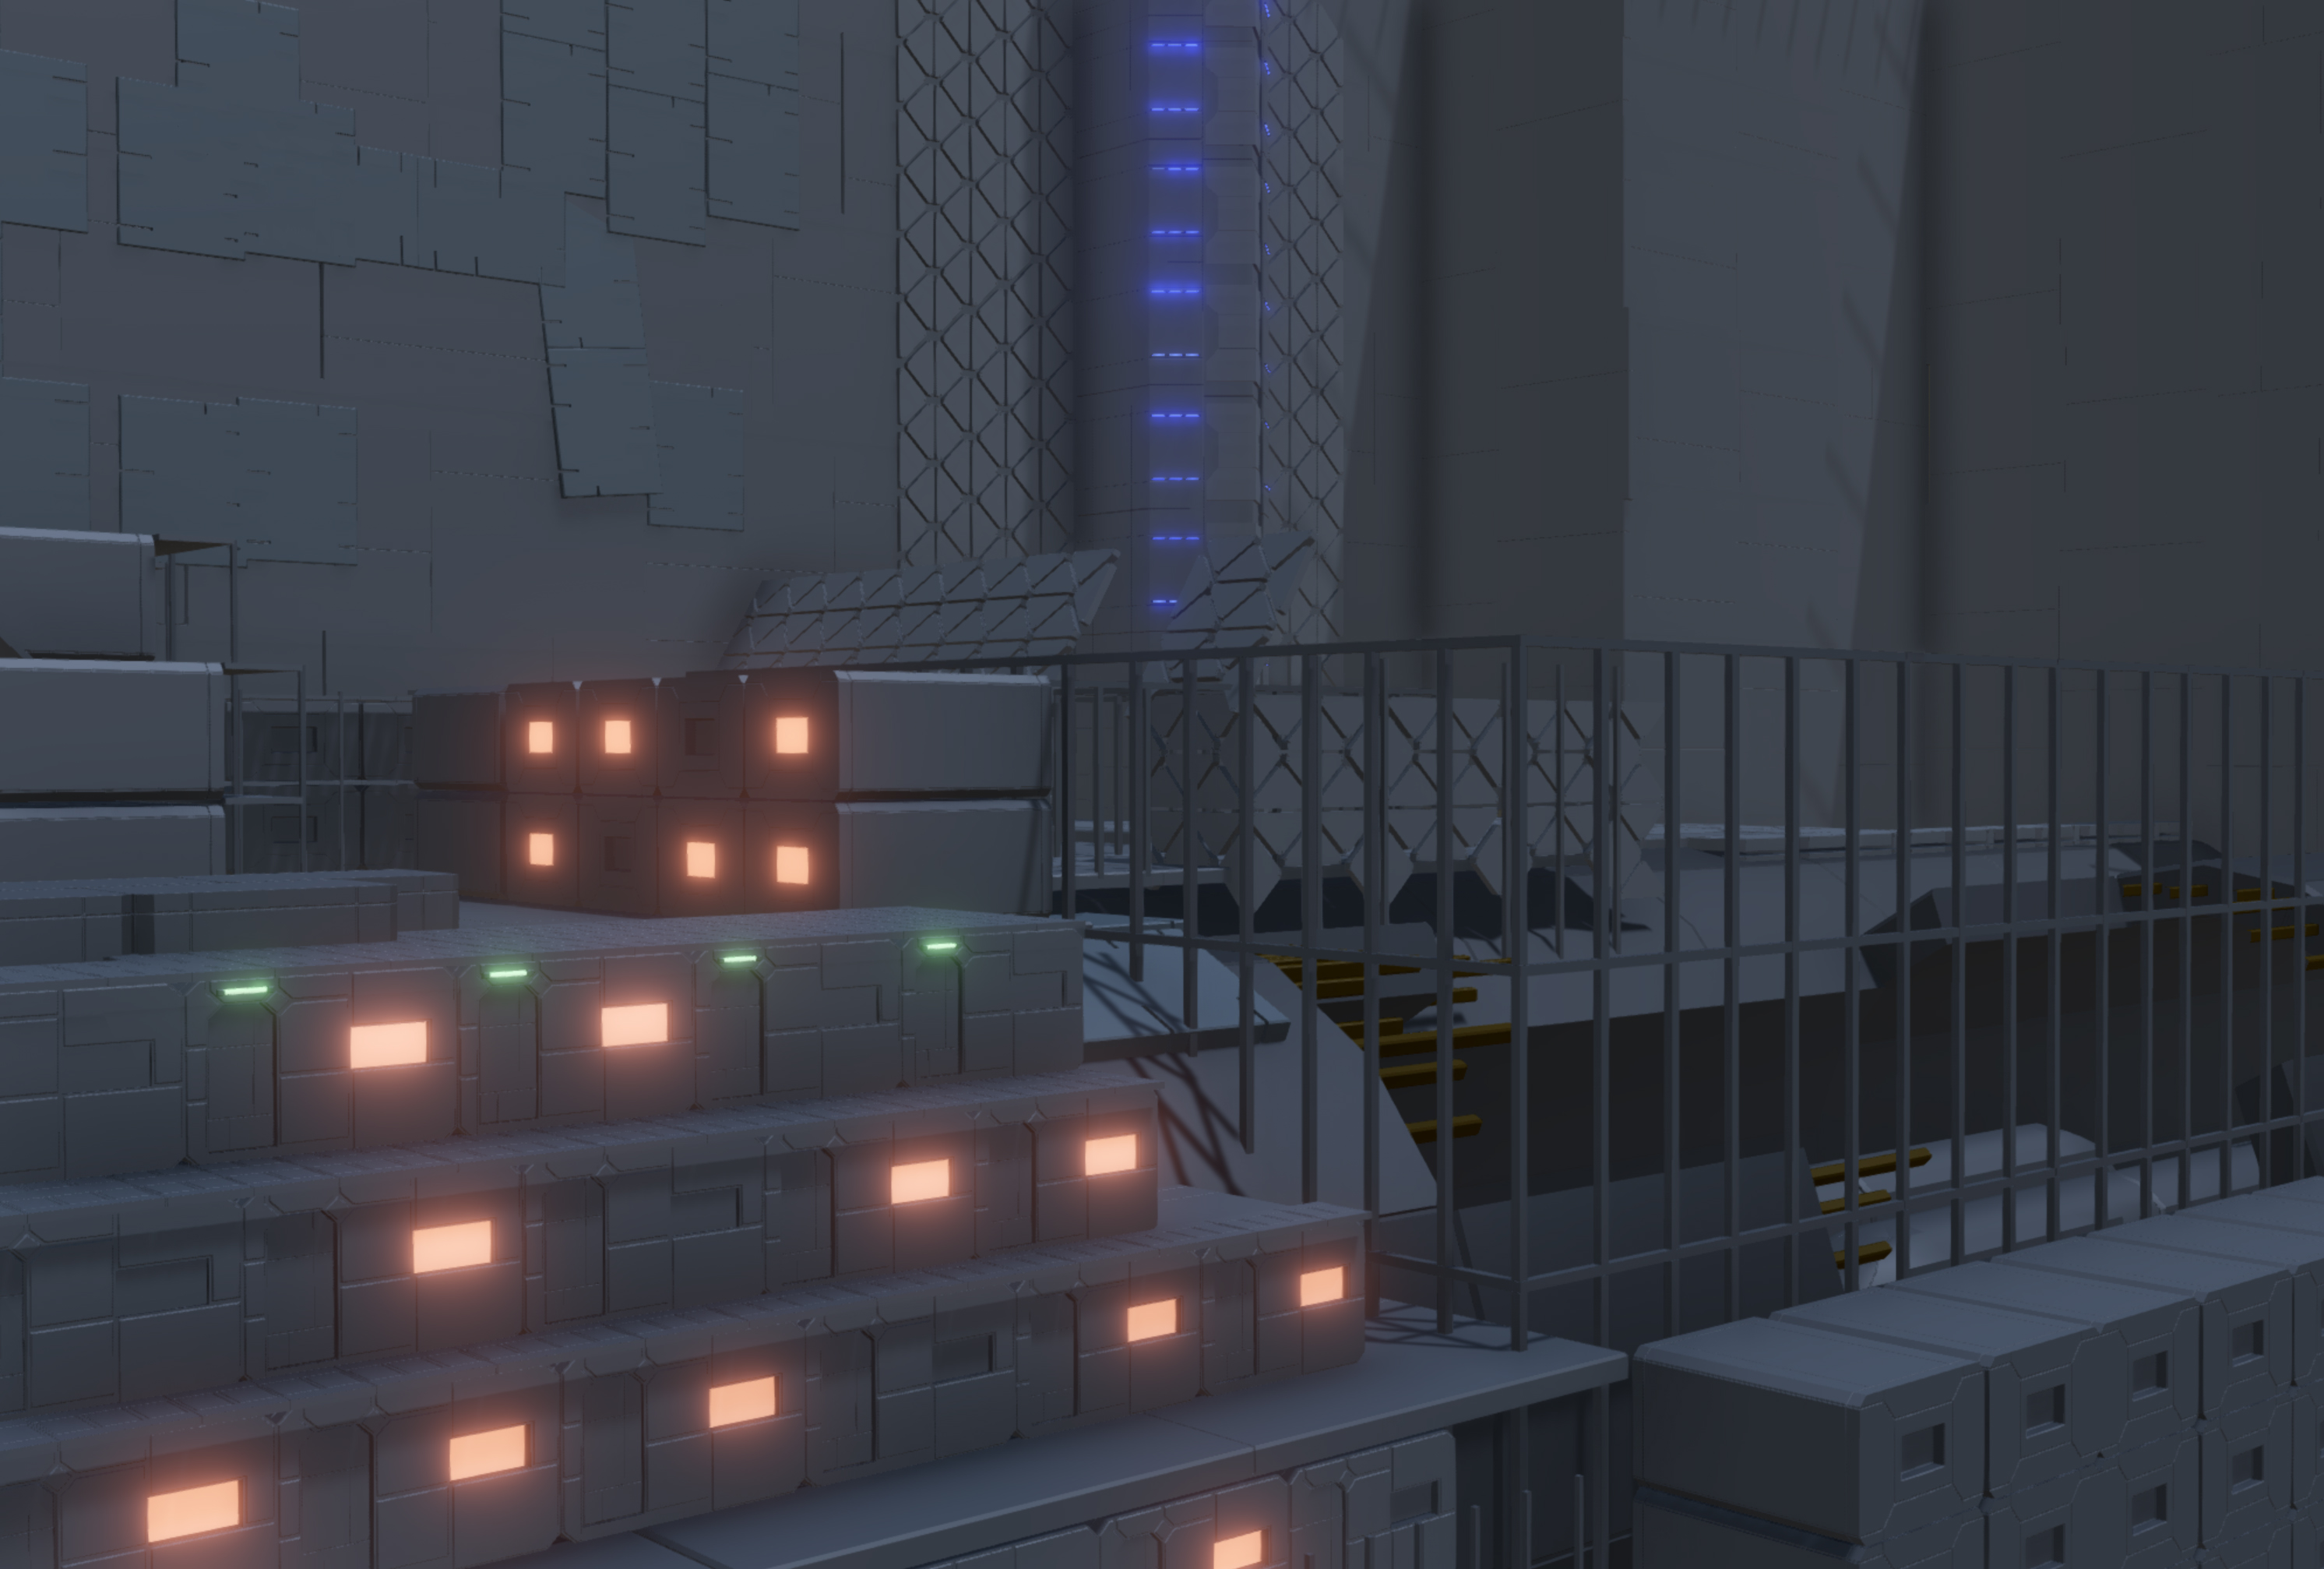 MegaTownCity